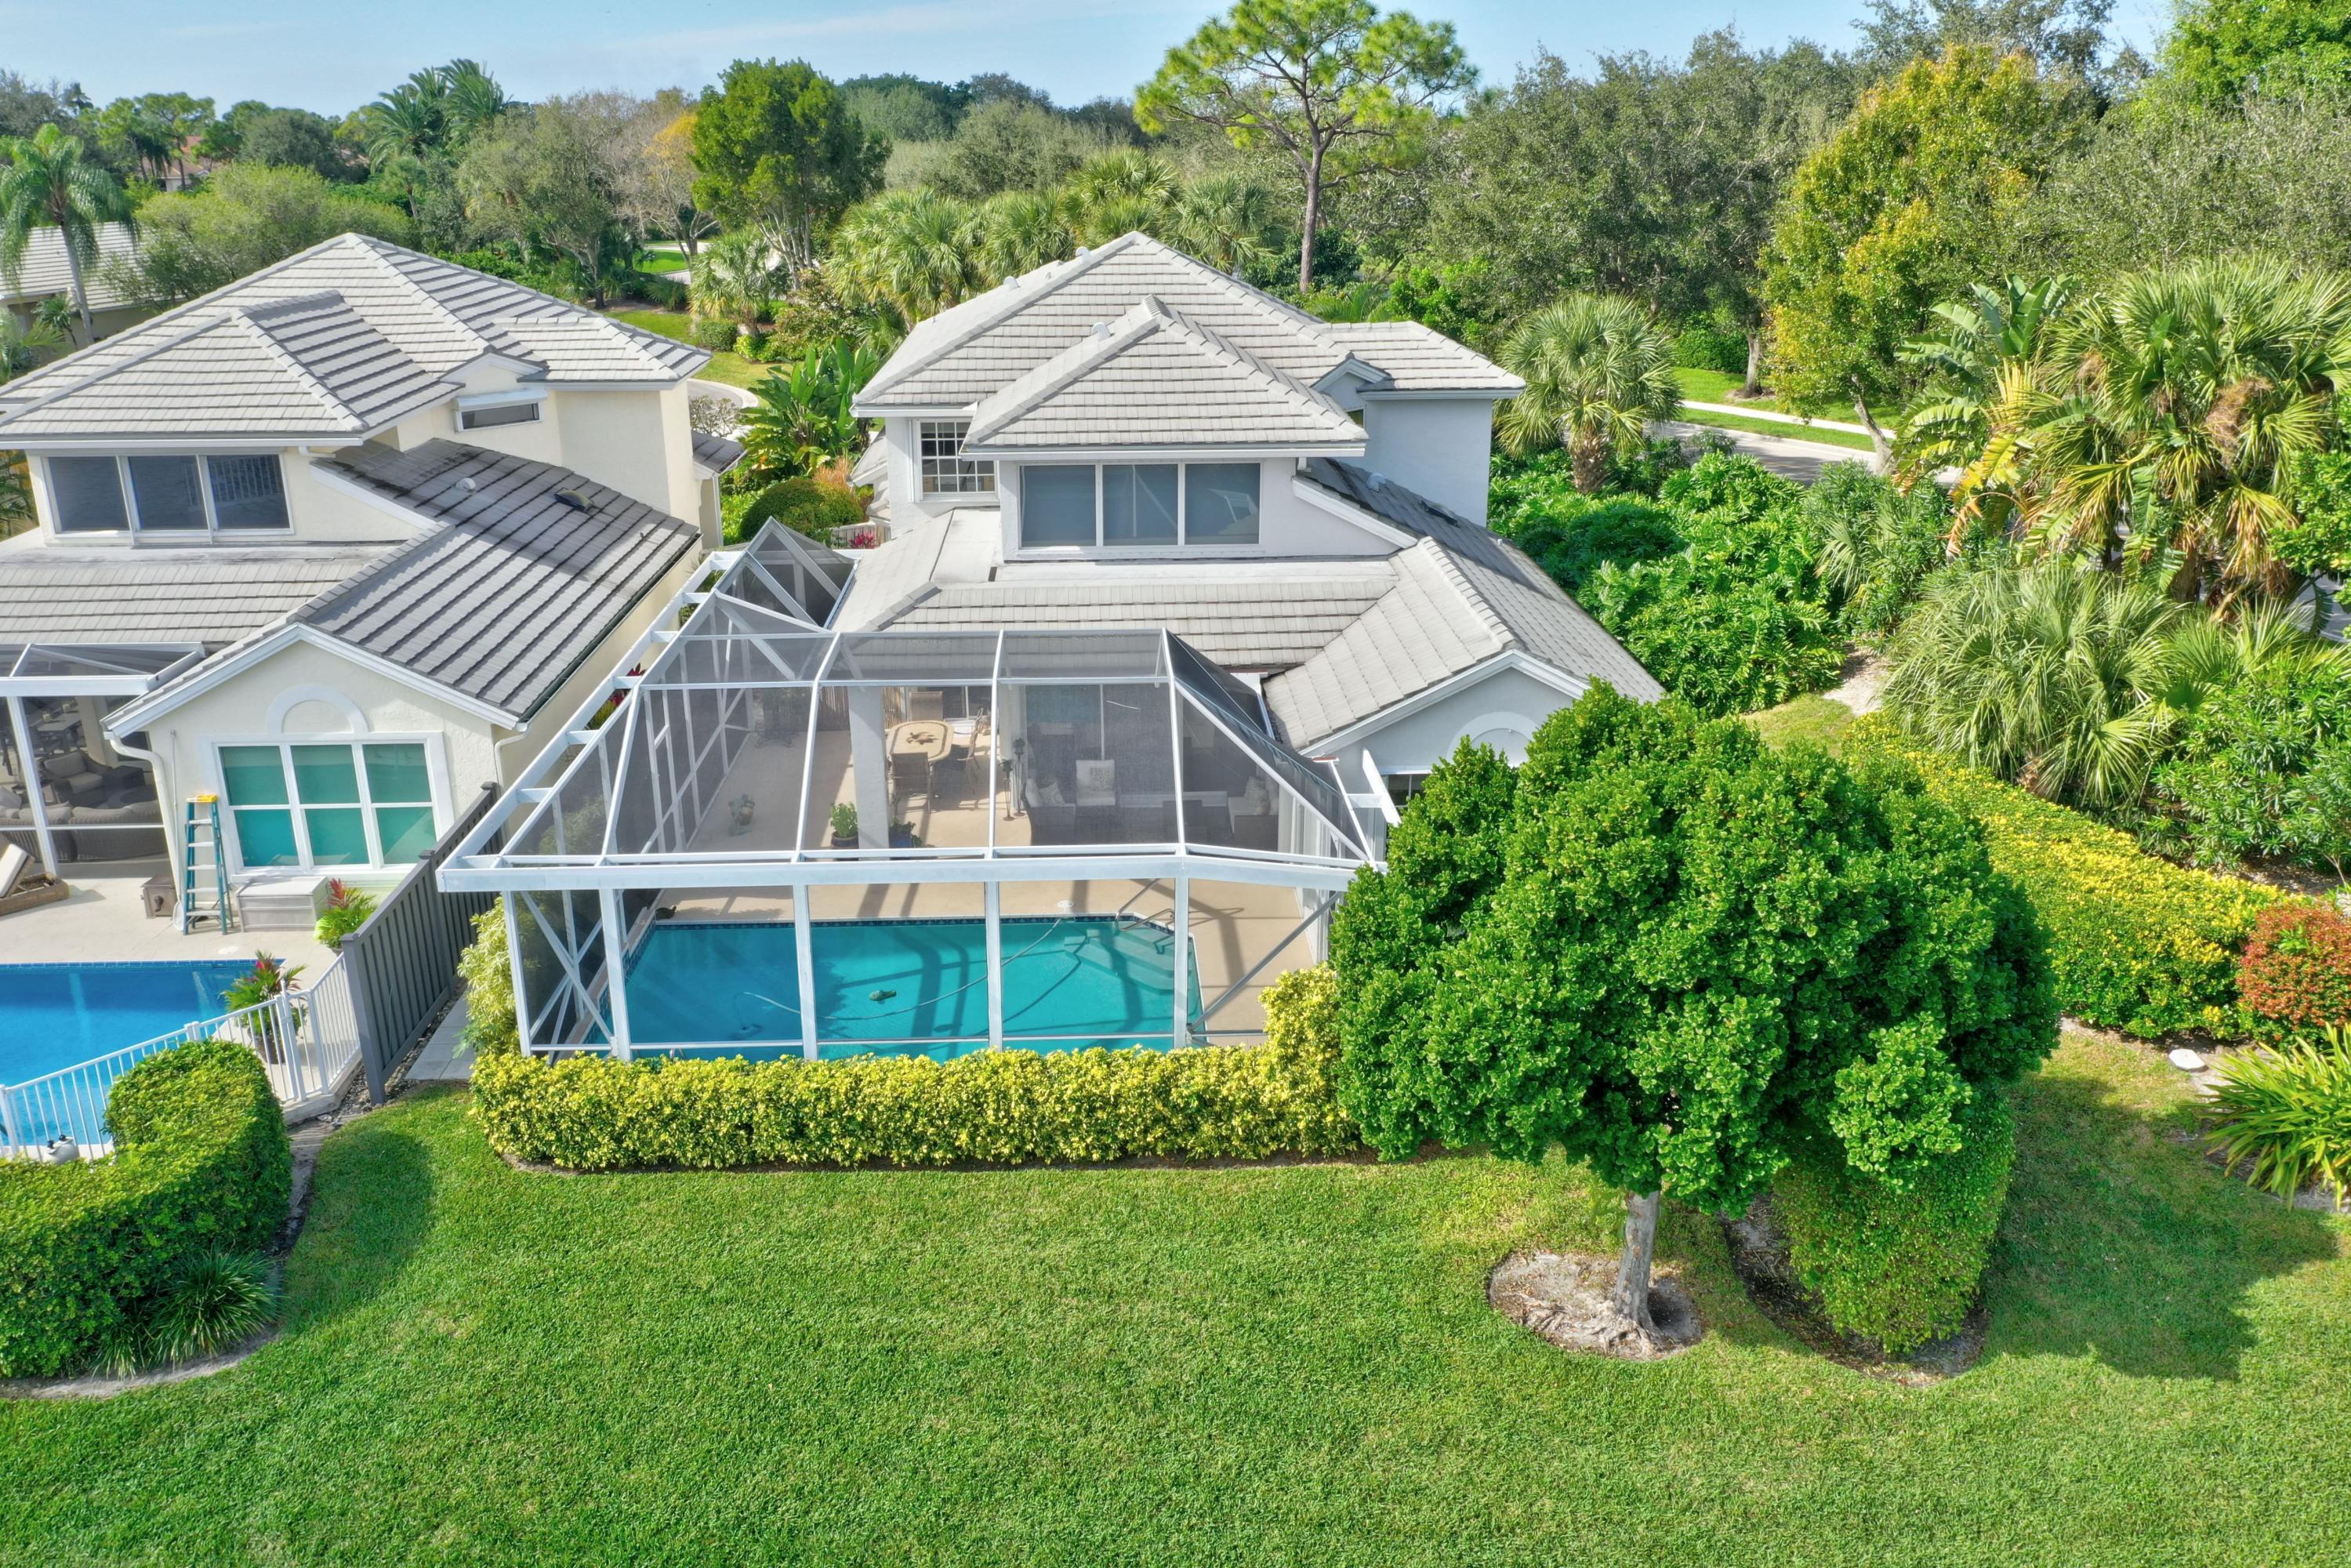 Home for sale in Pga National Resort & Spa Palm Beach Gardens Florida